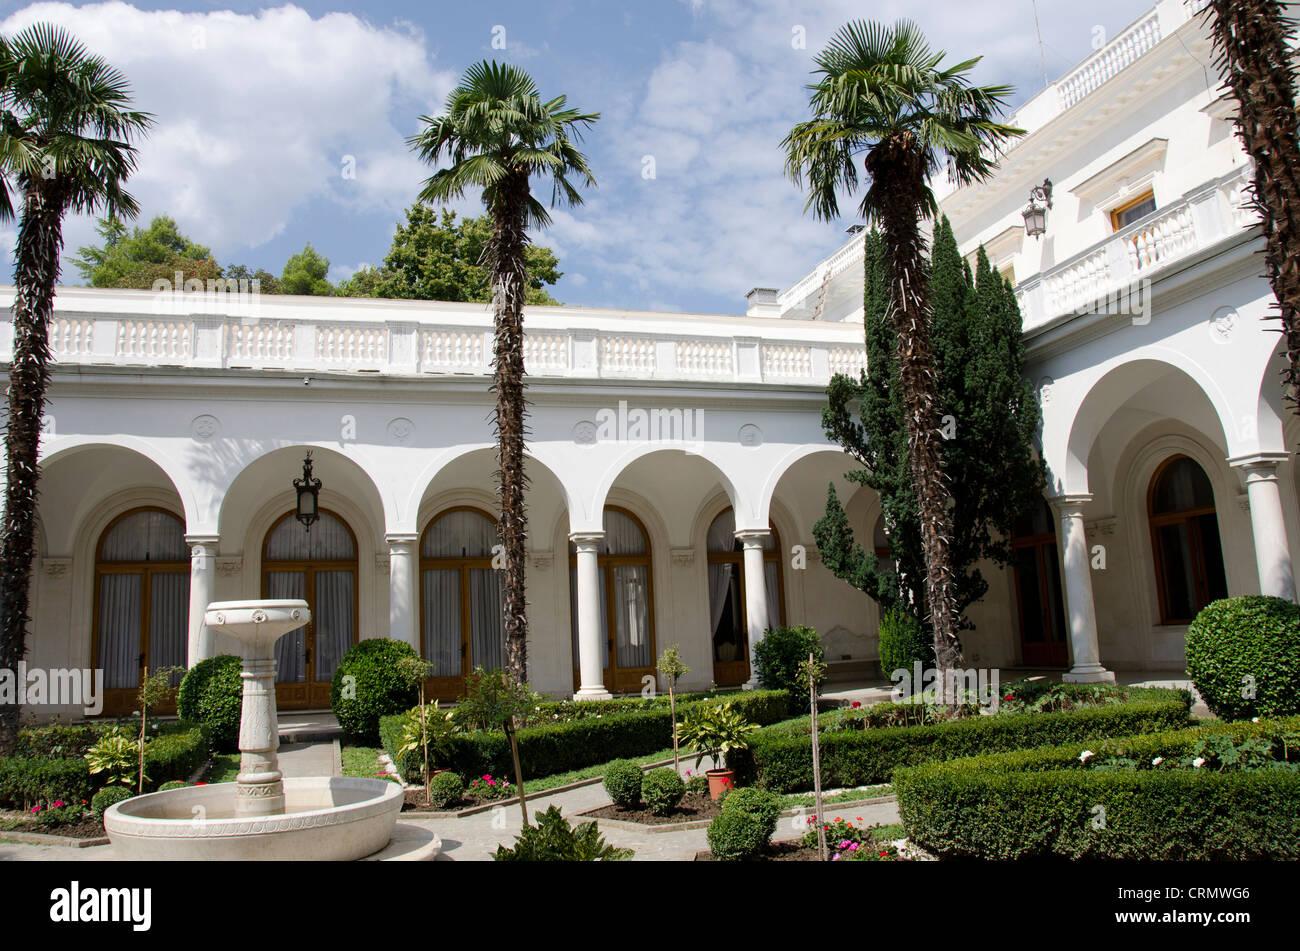 Ukraine, Yalta. Livadia Palace. 1911 summer home of the last Russian Tsar, Nicholas II. - Stock Image